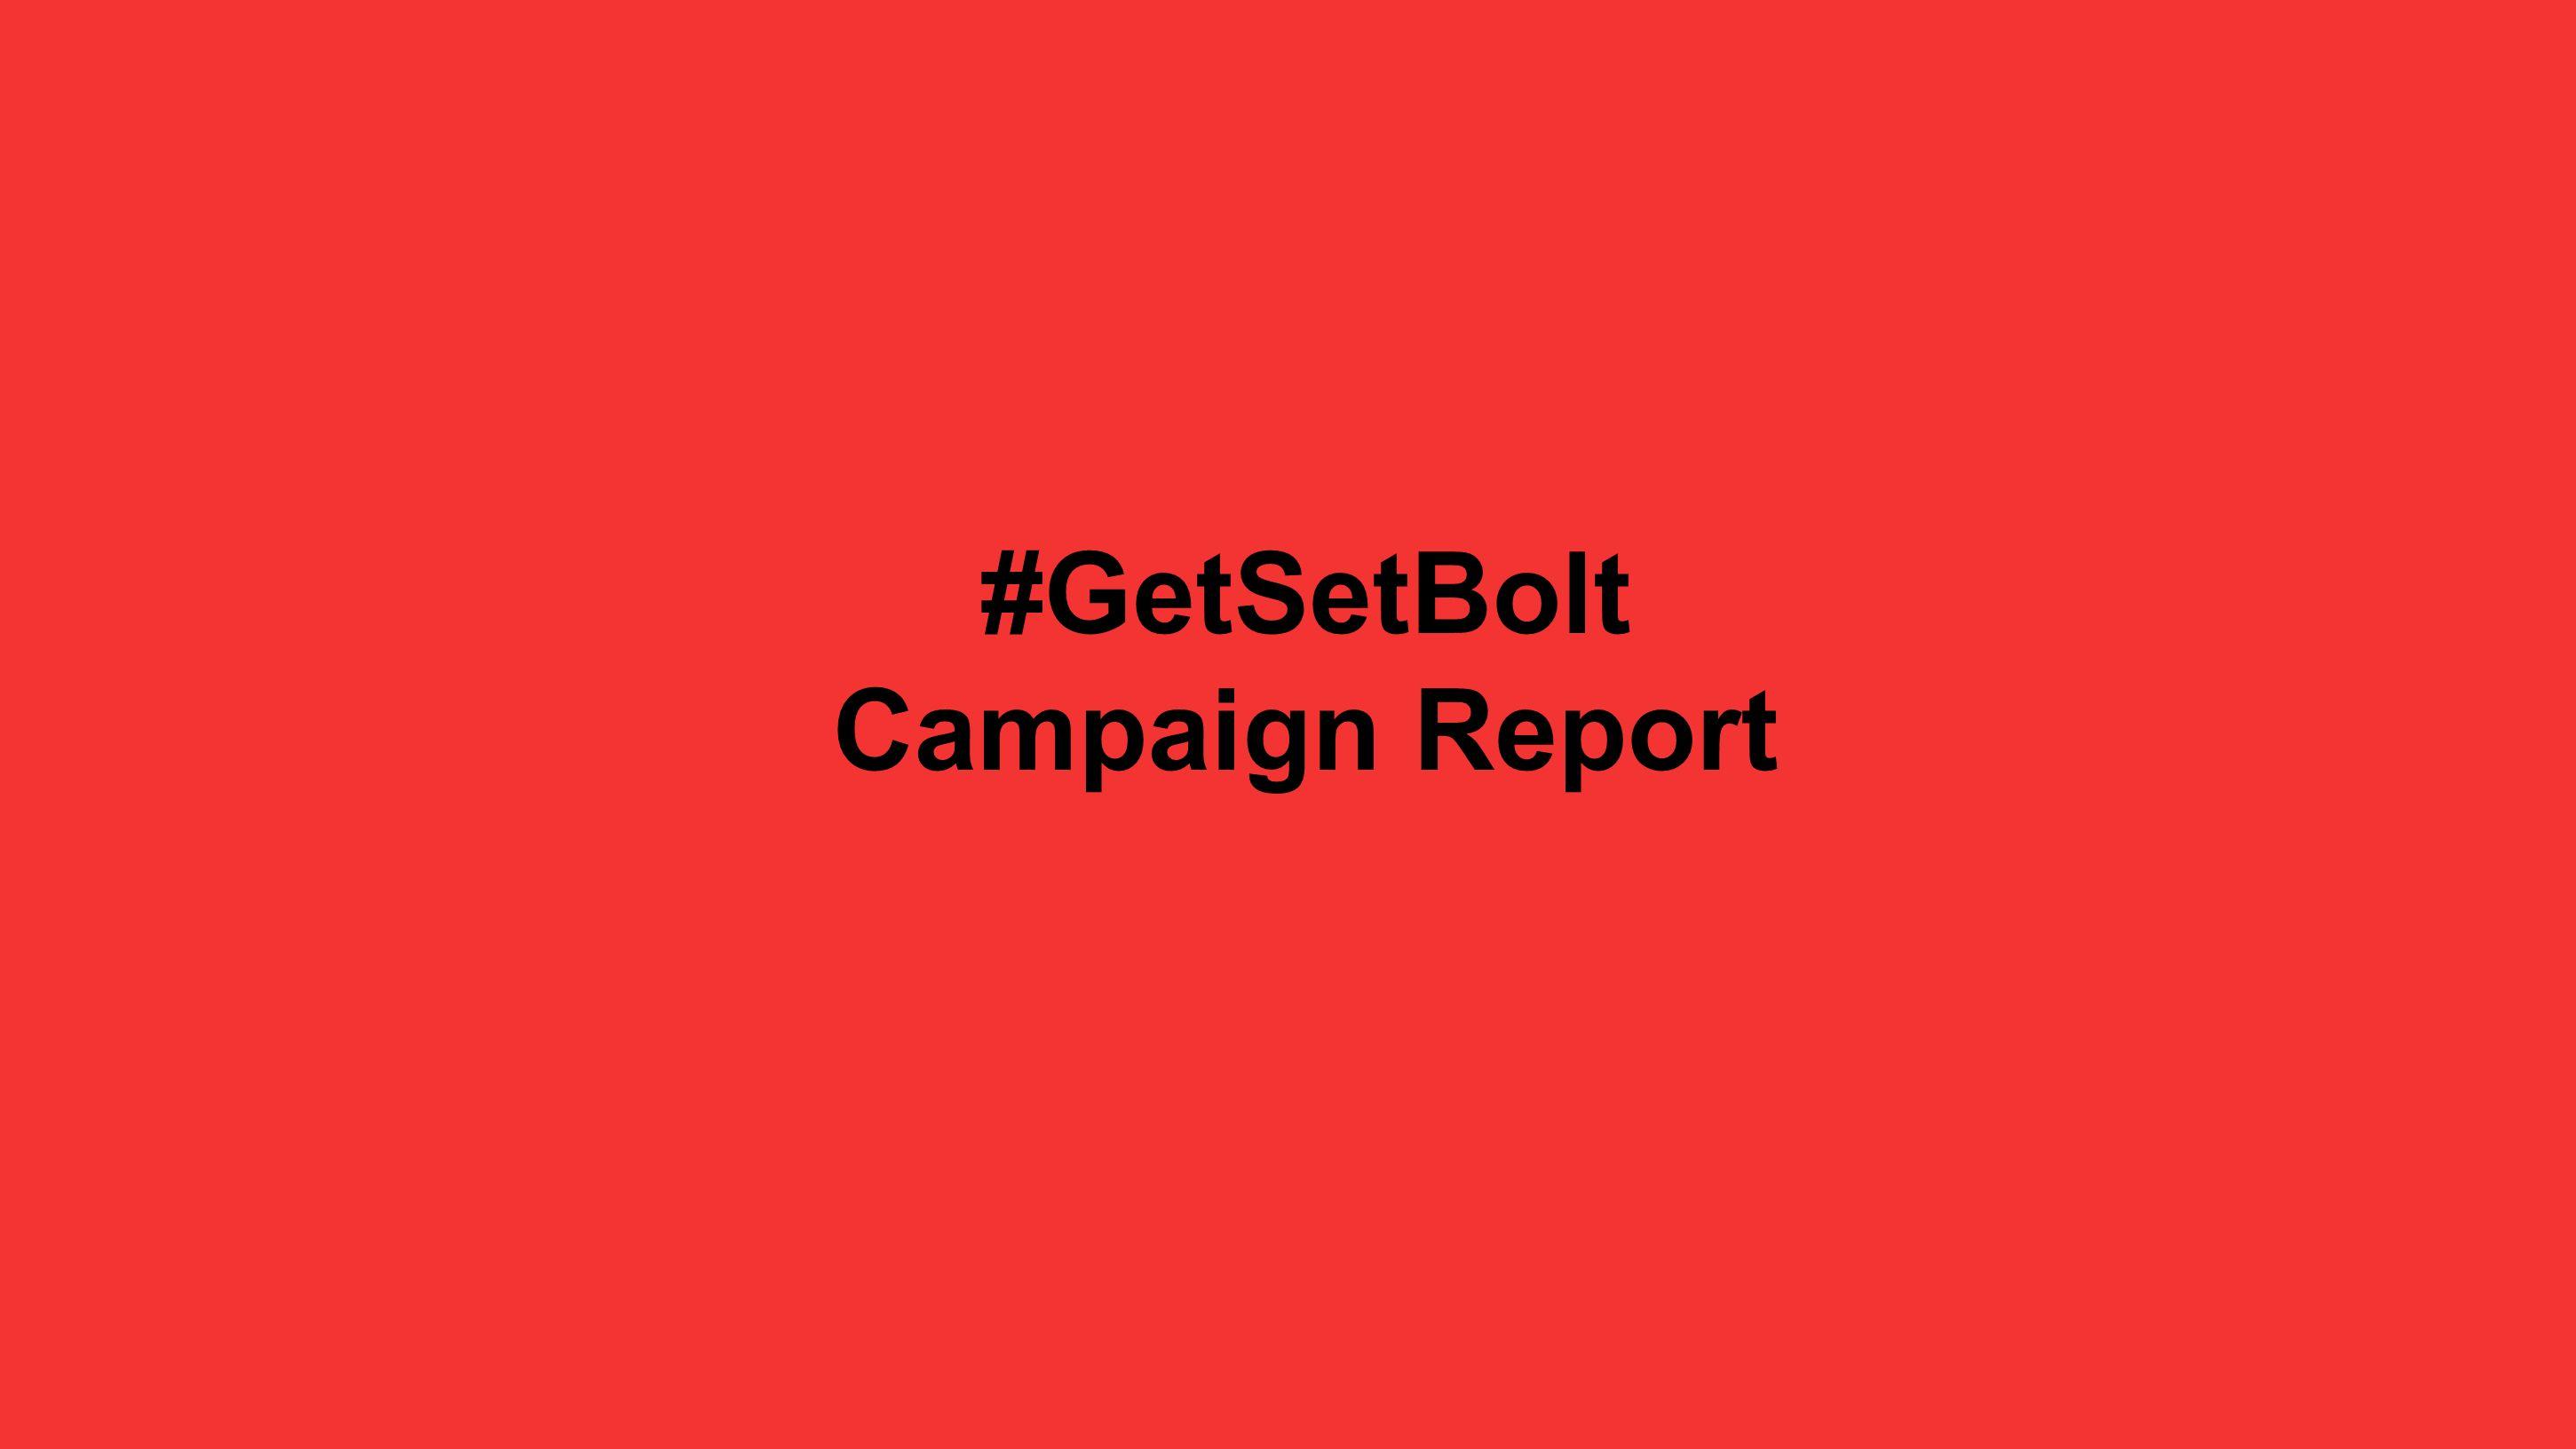 #GetSetBolt Campaign Report